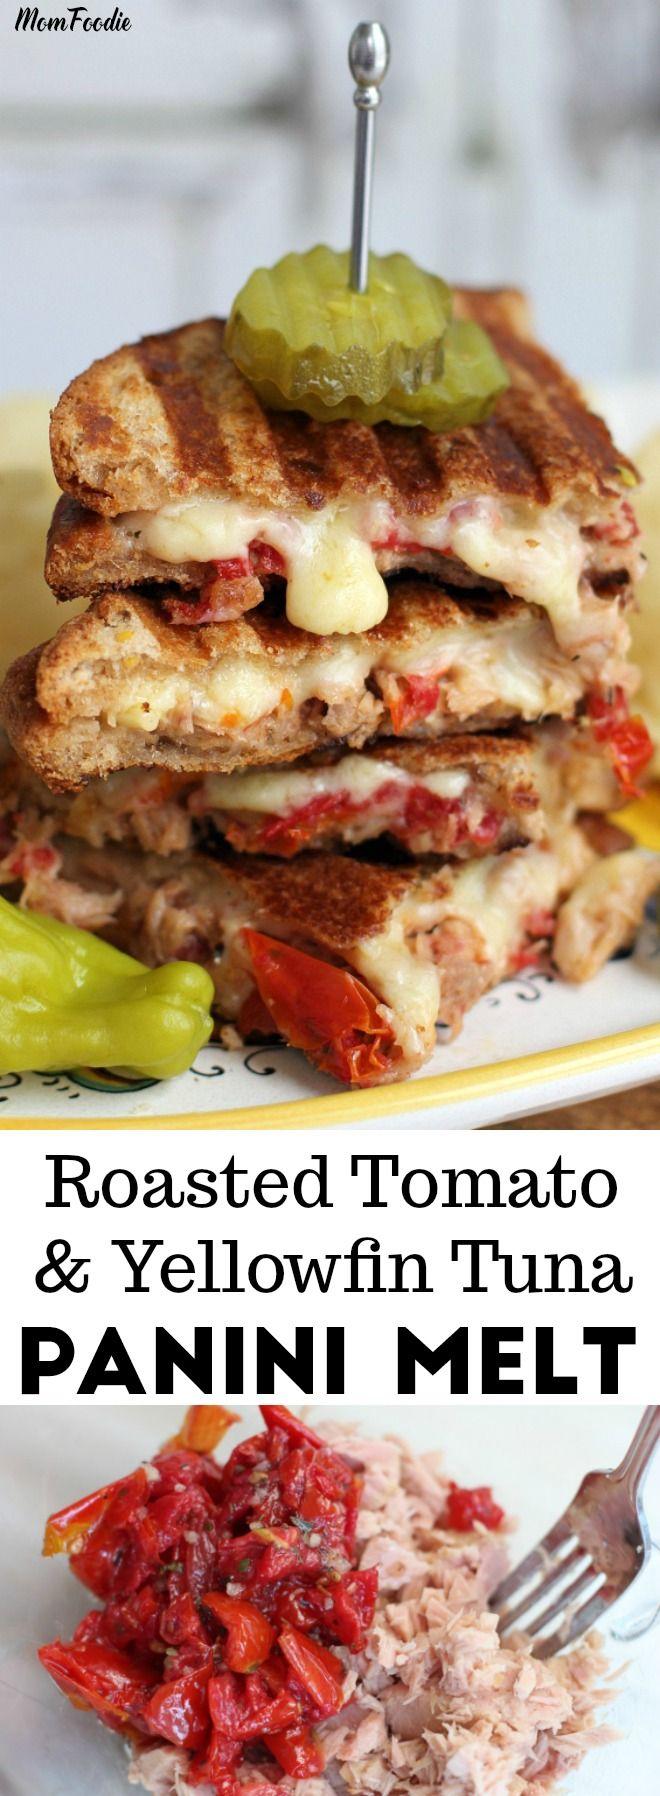 Gourmet Tuna Melt - Roasted Tomato and Yellowfin T…